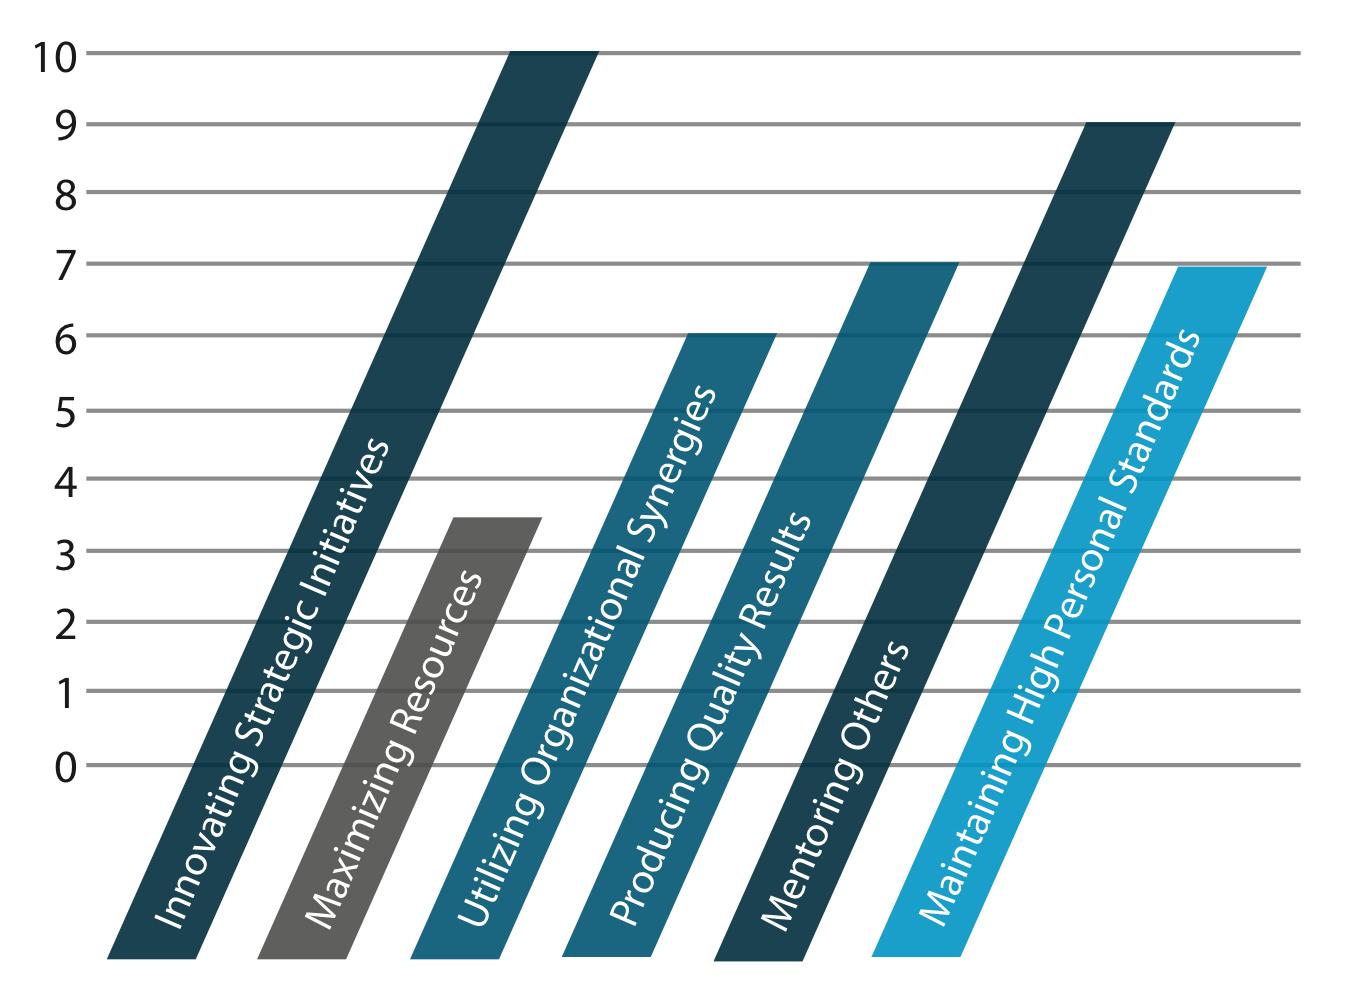 ProfileXT Executive Leadership Report chart